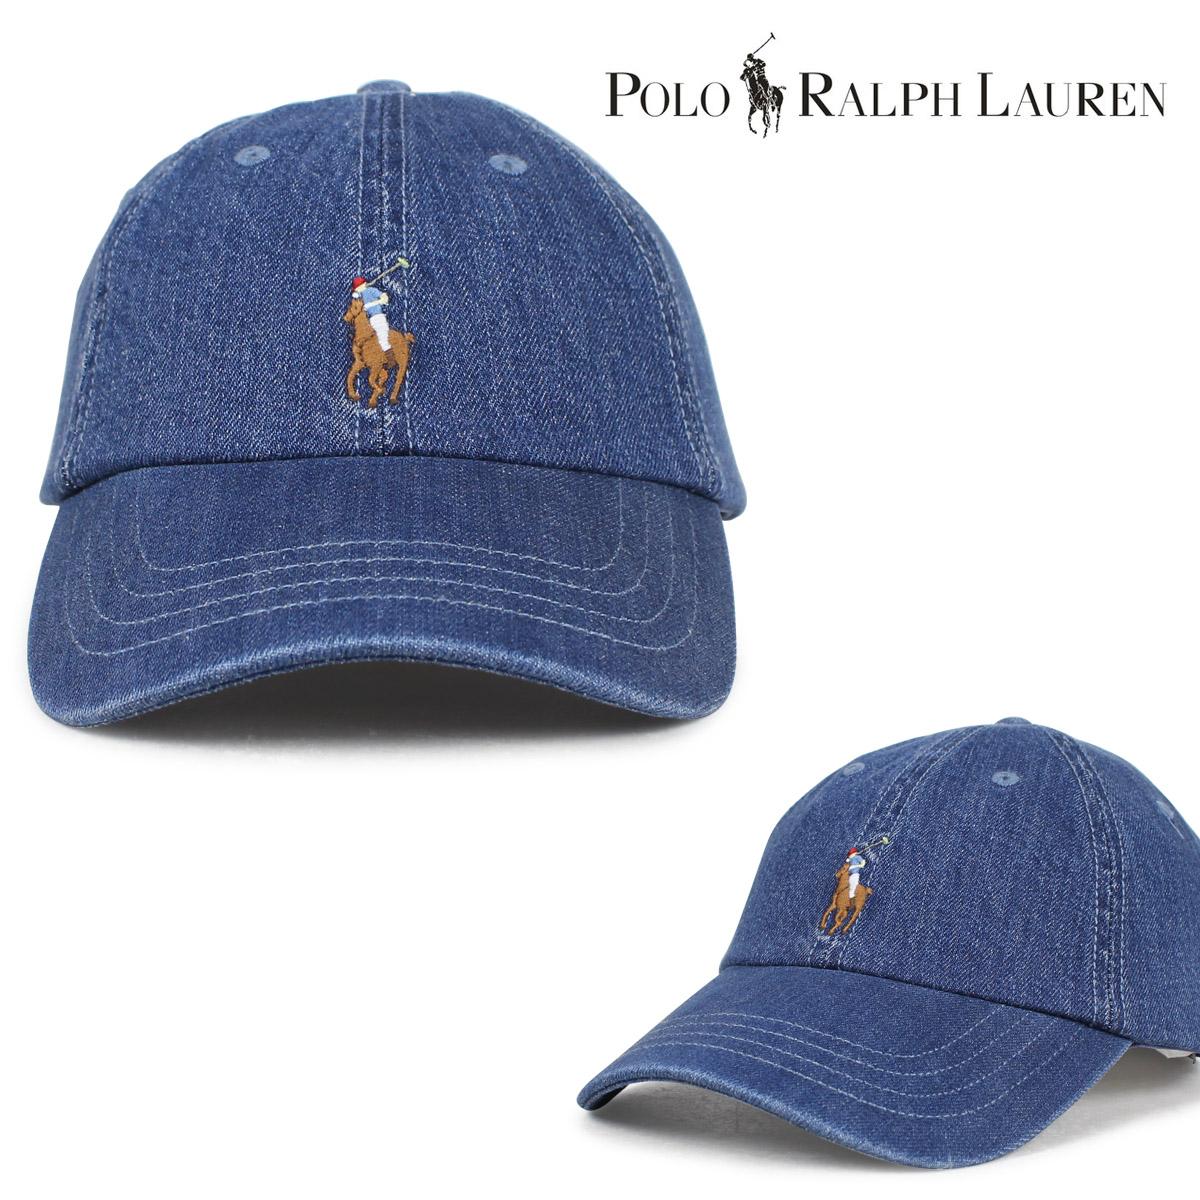 755853096c7 Whats up Sports  POLO RALPH LAUREN 710674341 hat men gap Dis cap ...